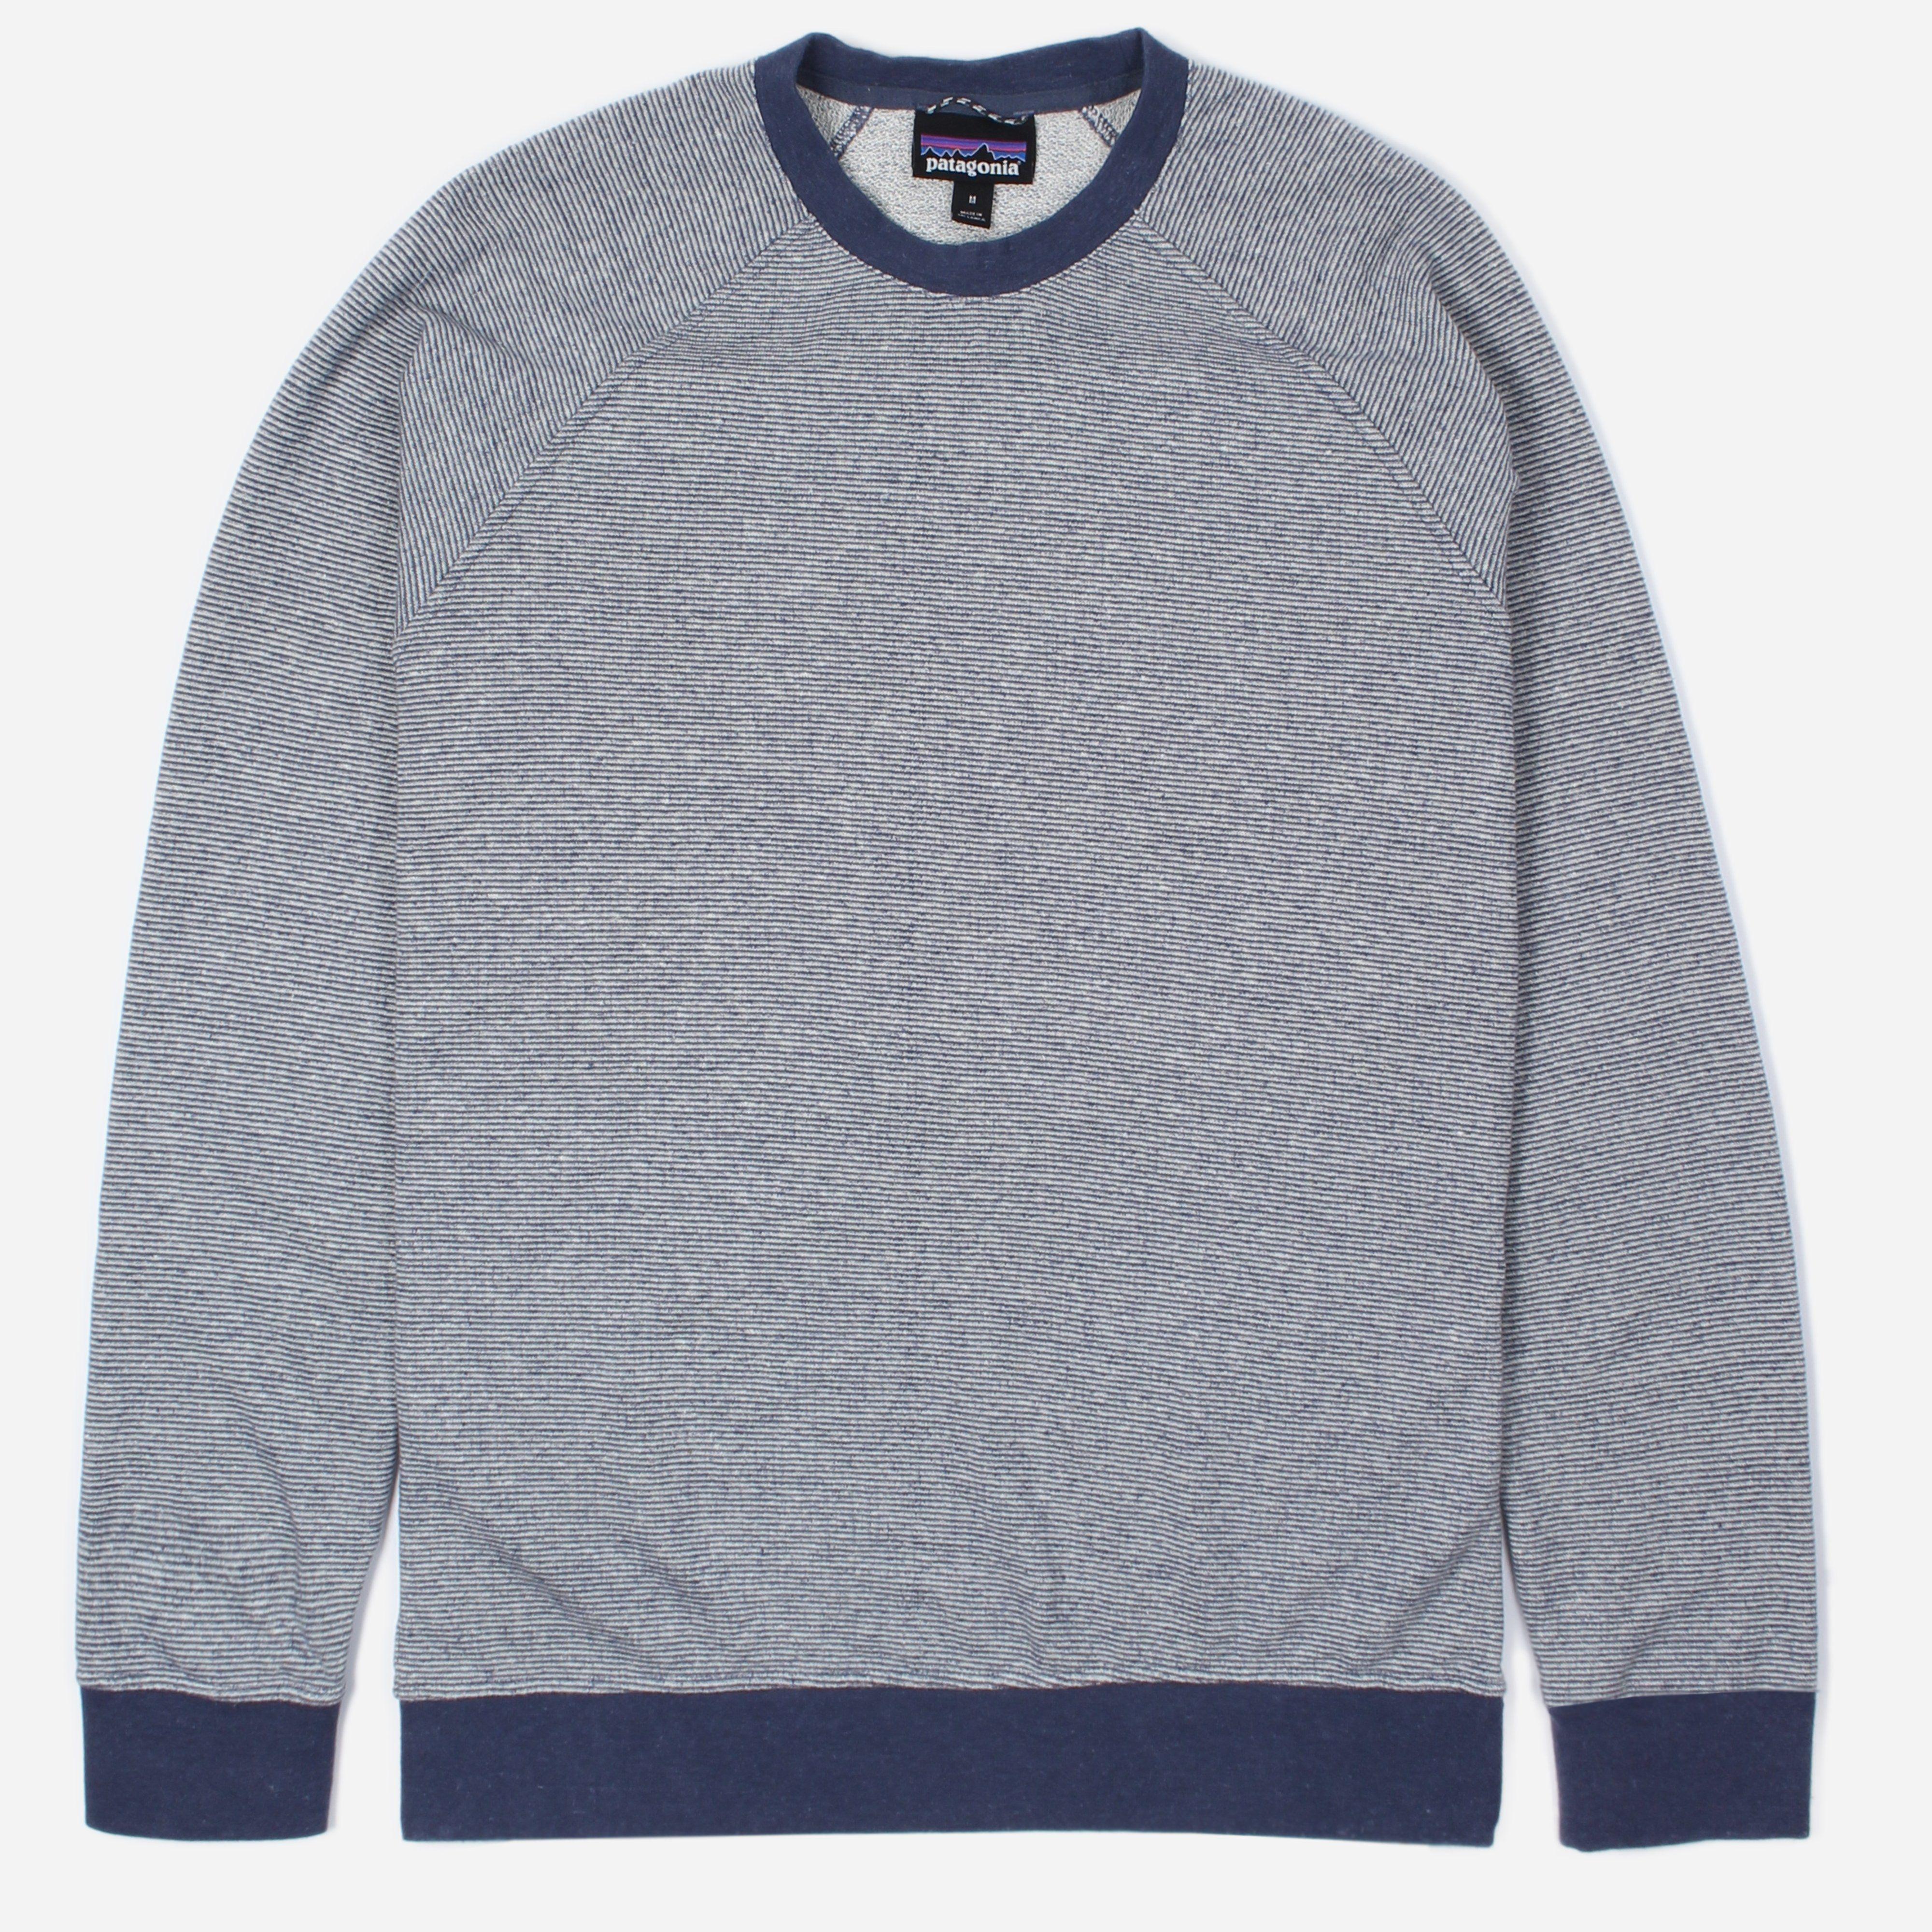 Patagonia Trail Harbour Sweatshirt